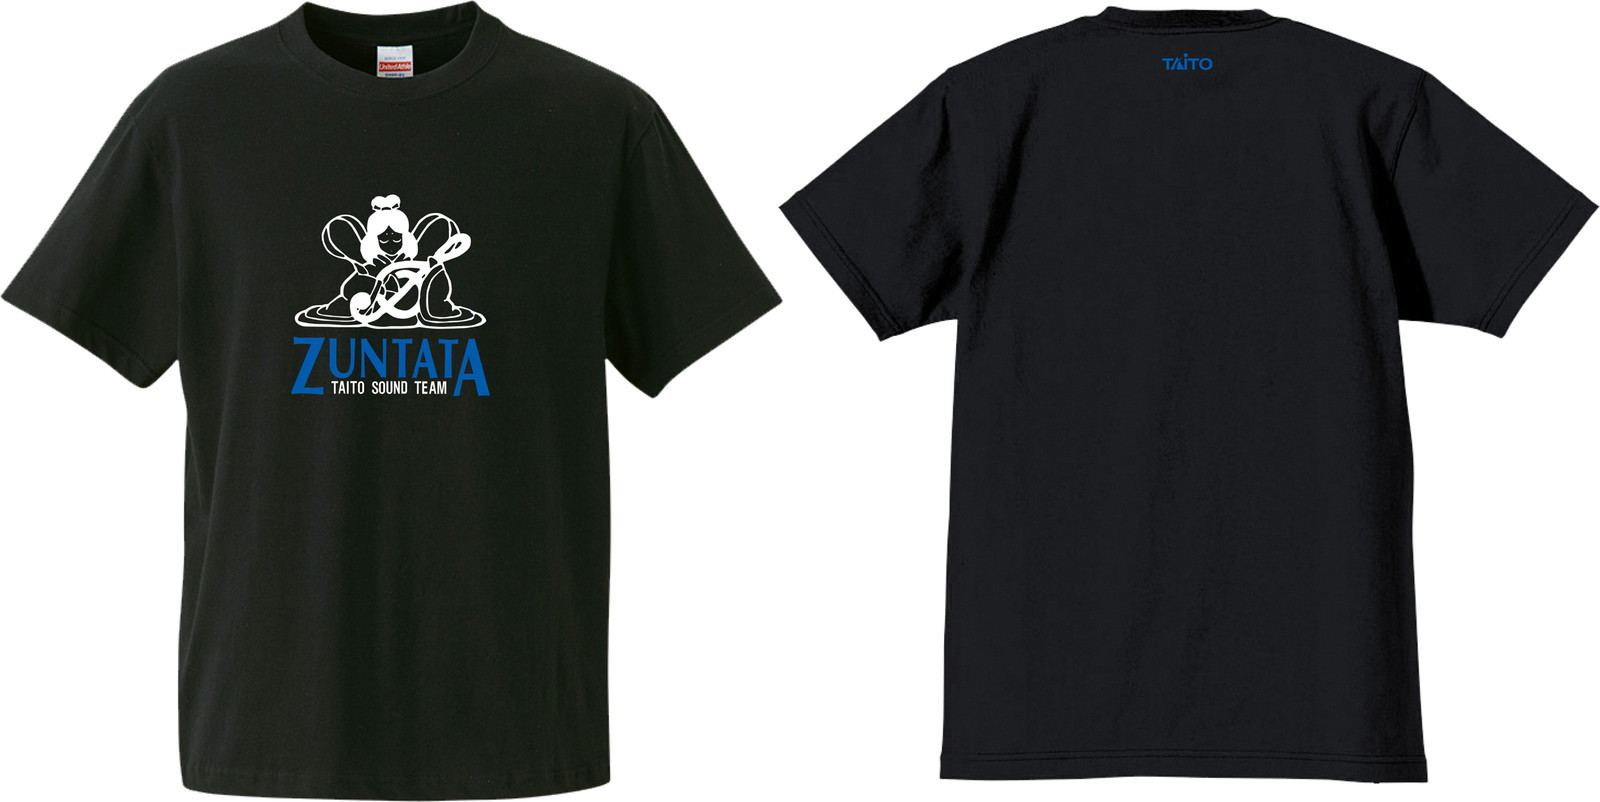 ZUNTATA ロゴ Tシャツ 2nd ブラック